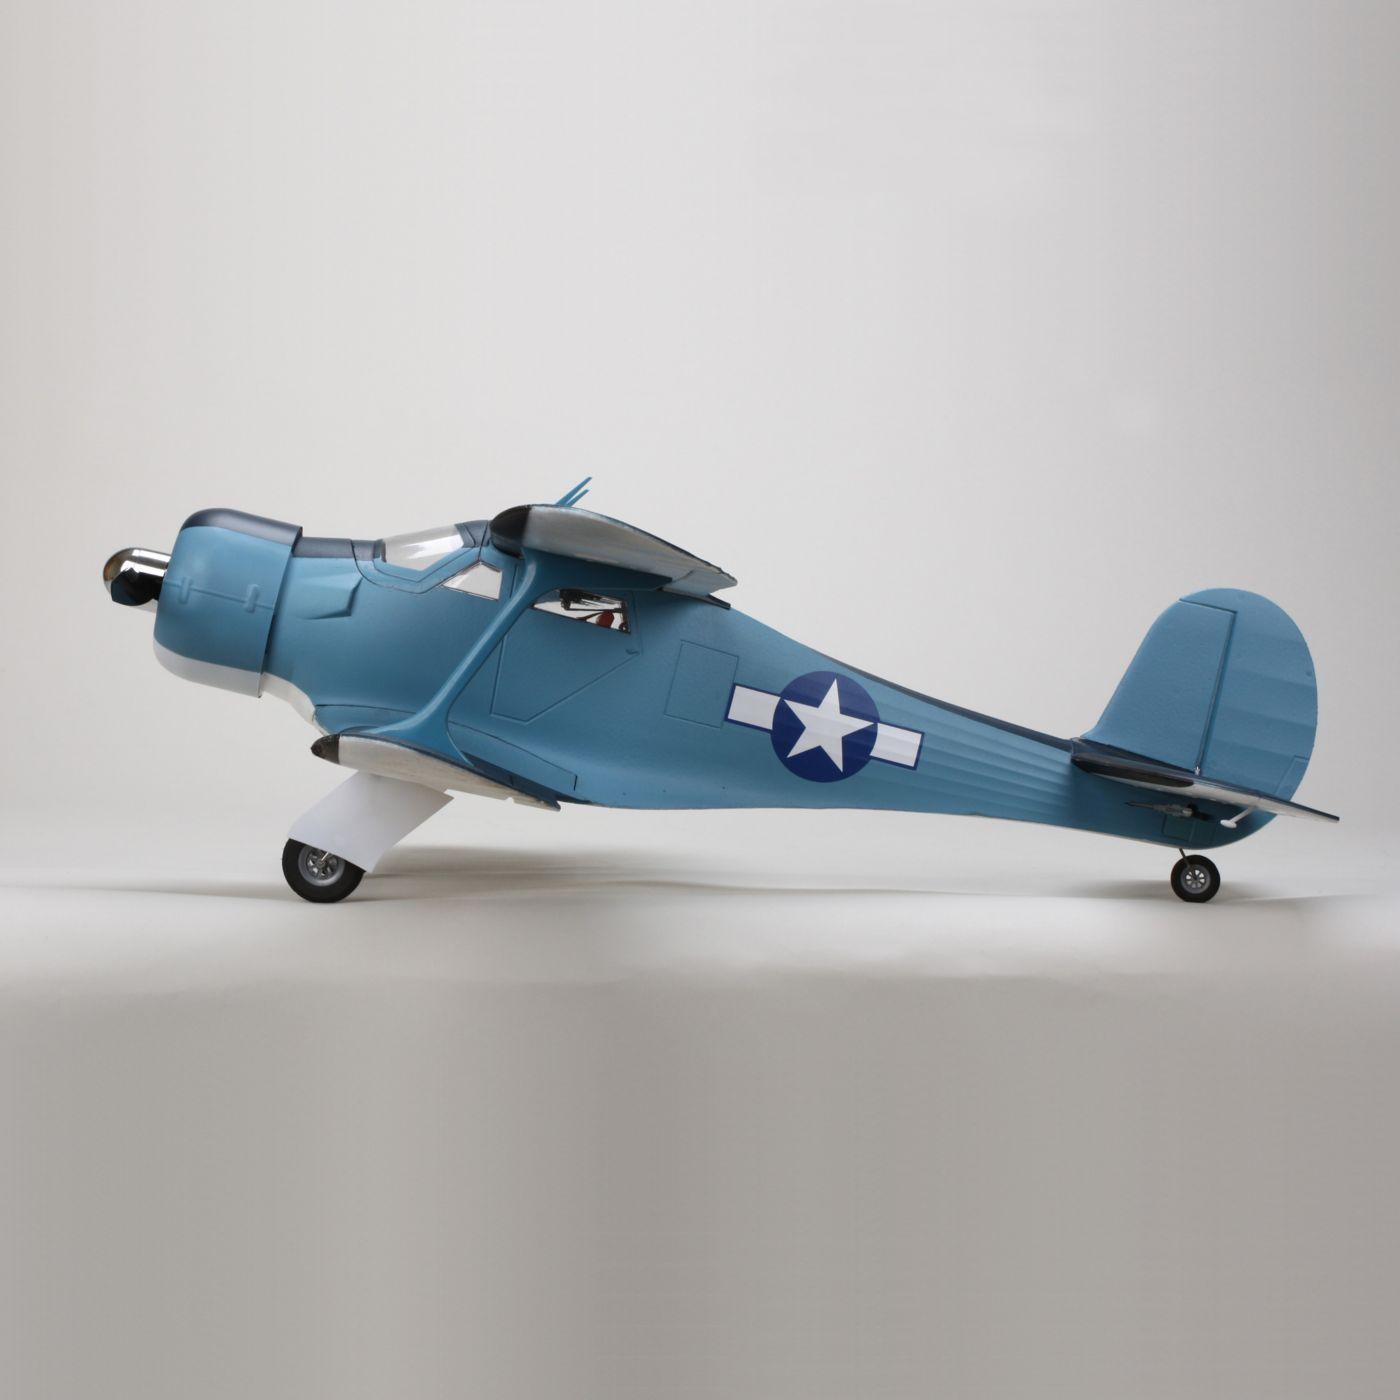 Beechcraft Staggerwing E-flite